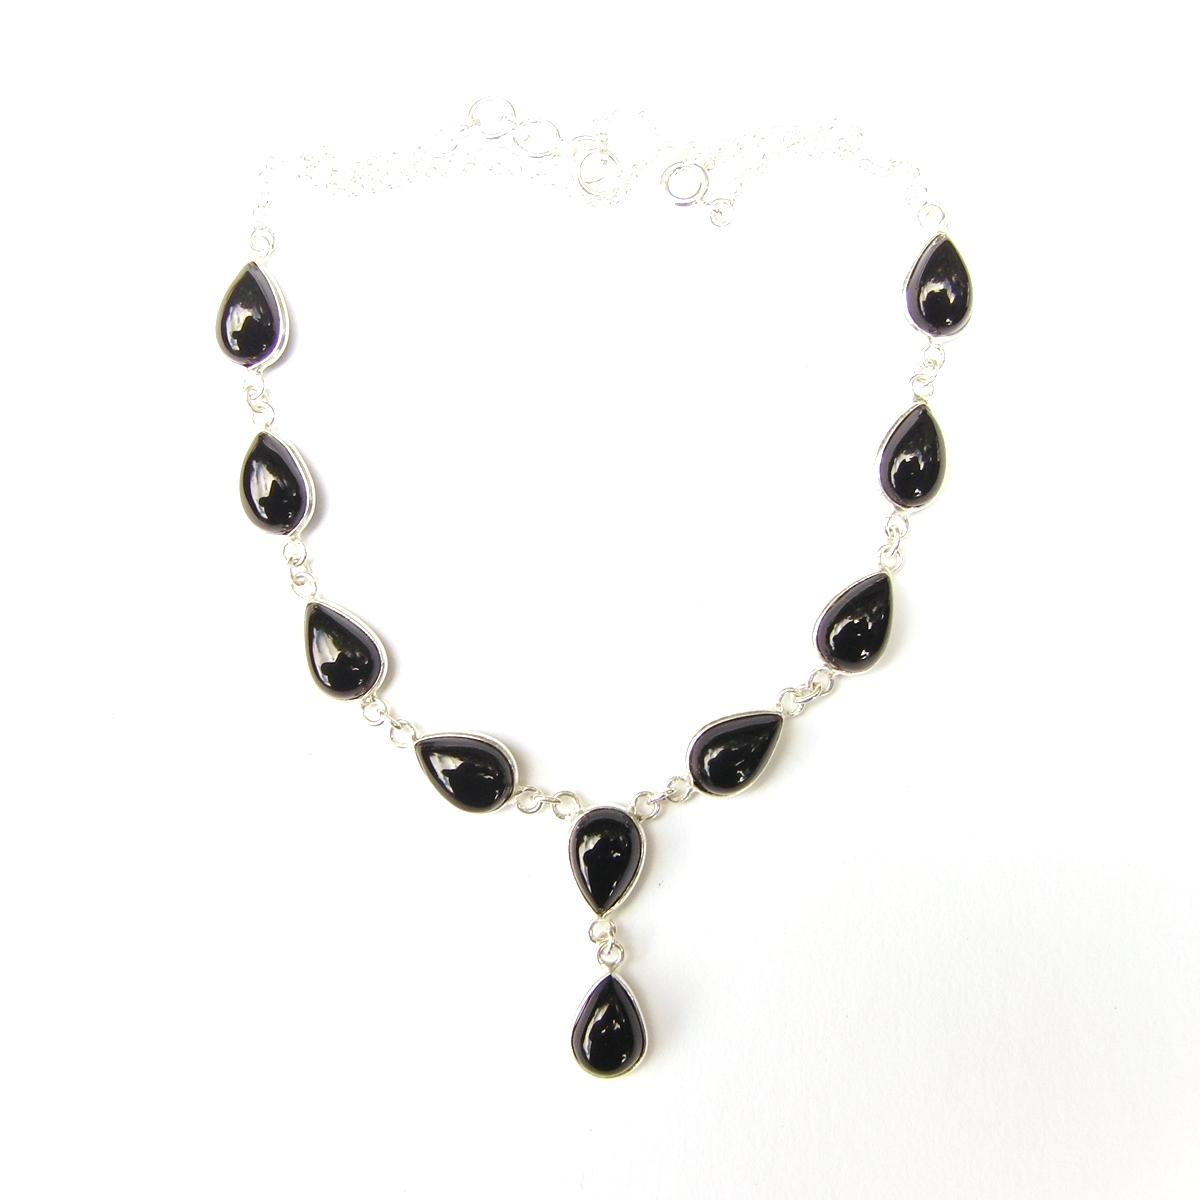 Black Onyx Large Teardrop Necklace.